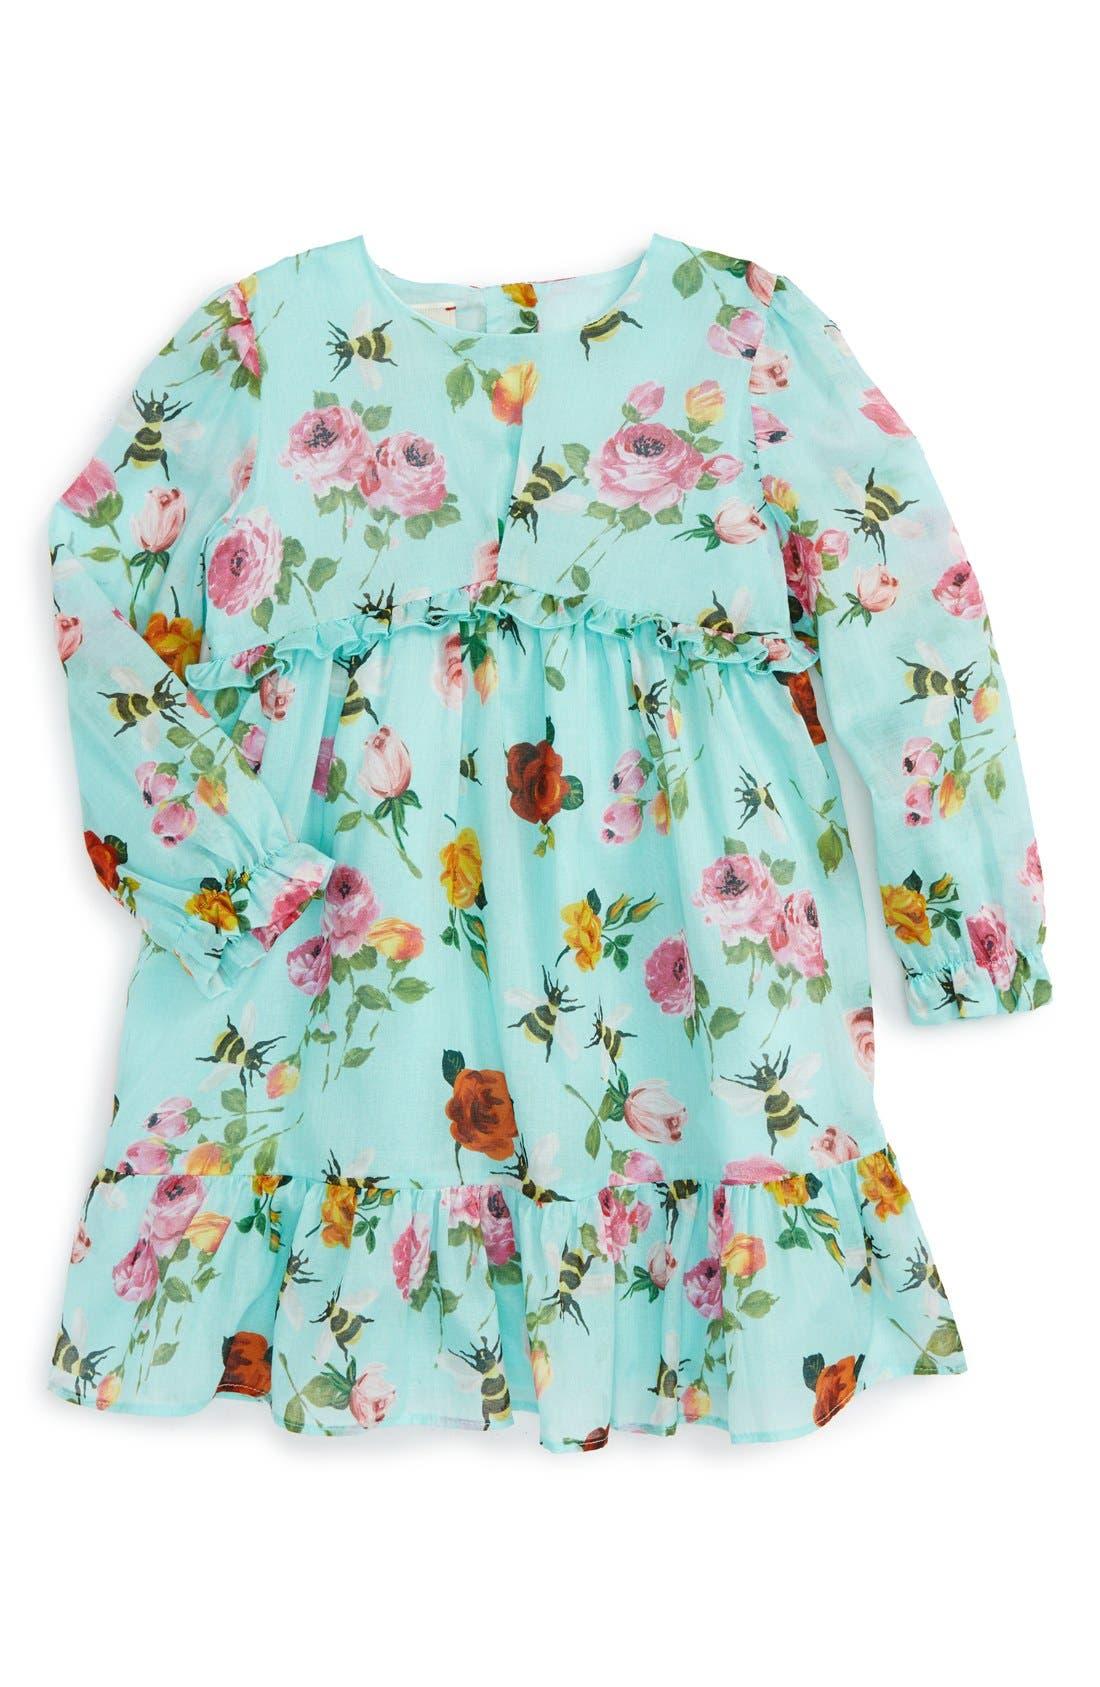 Floral Print Long Sleeve Dress, Main, color, 440